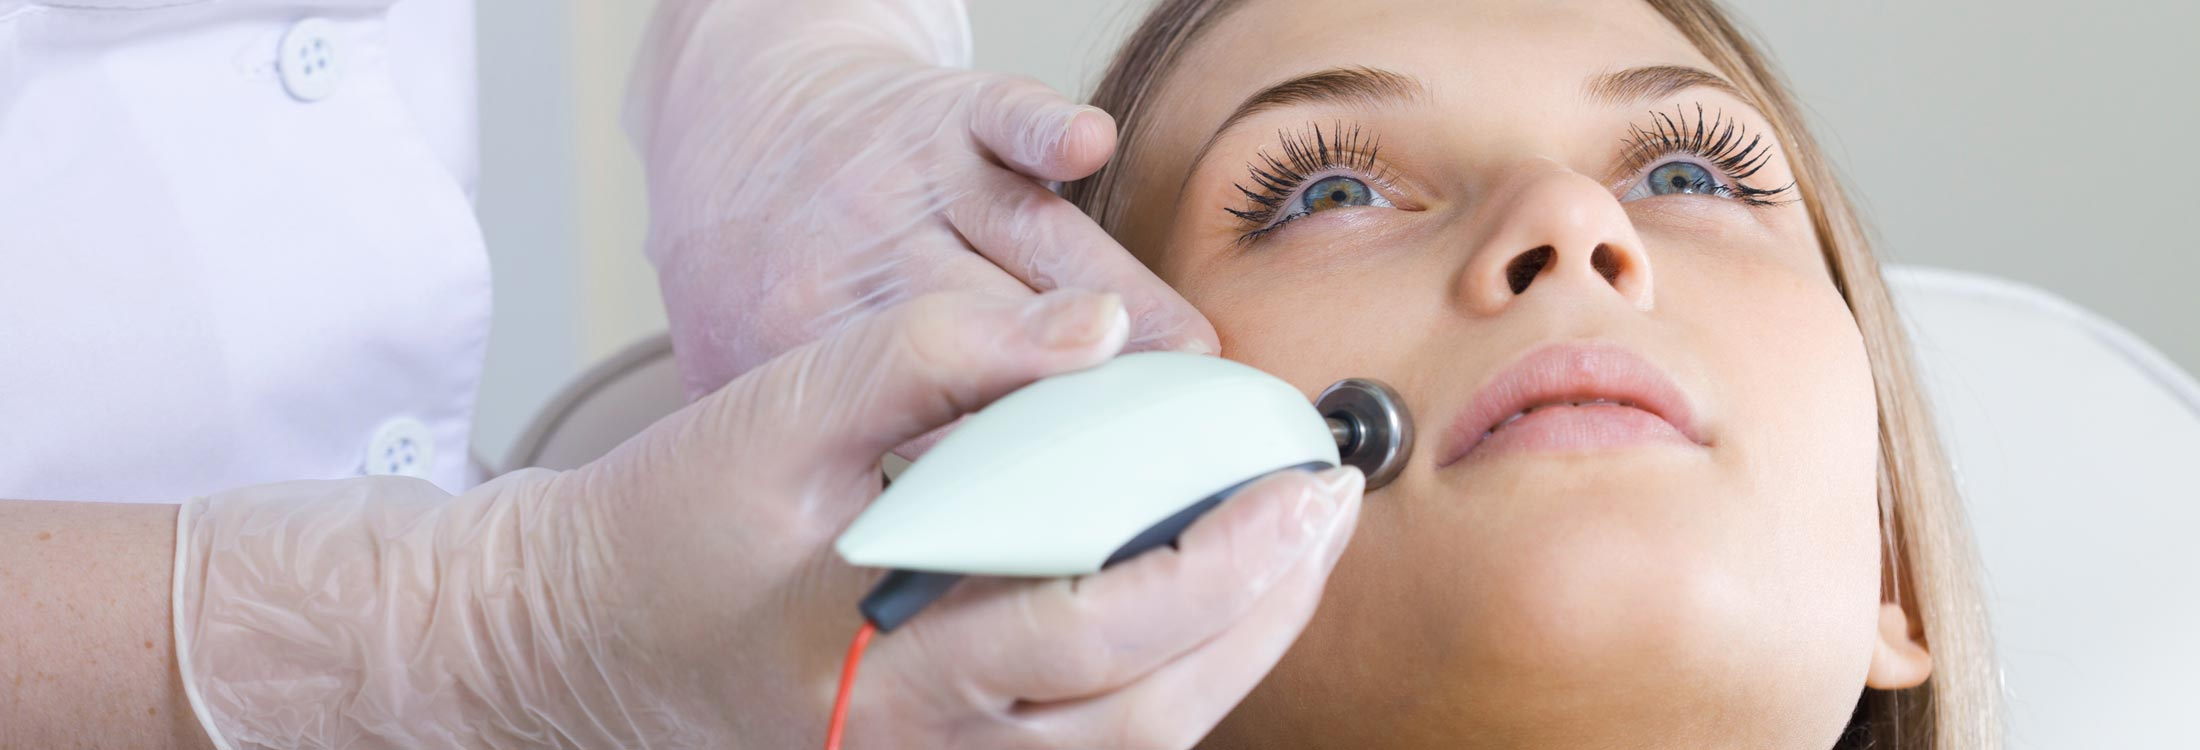 Radien Dermatology - Laser Therapy